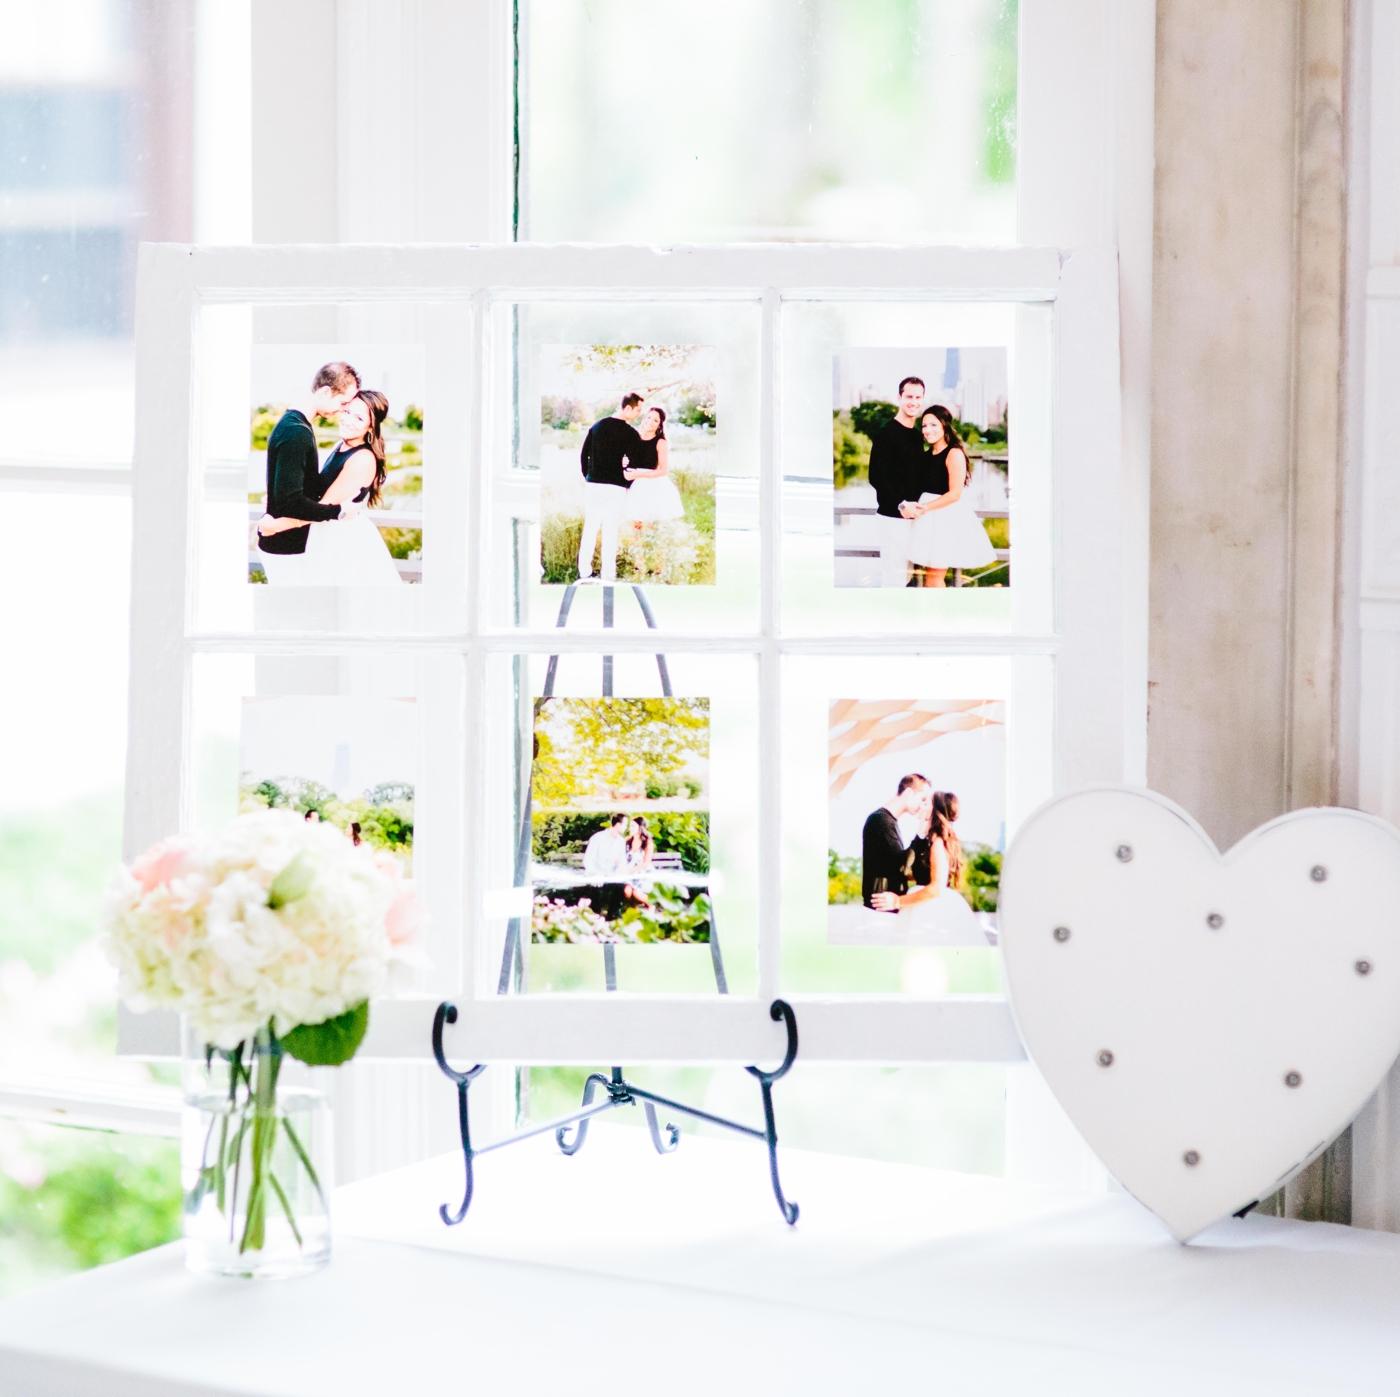 chicago-fine-art-wedding-photography-smeja35